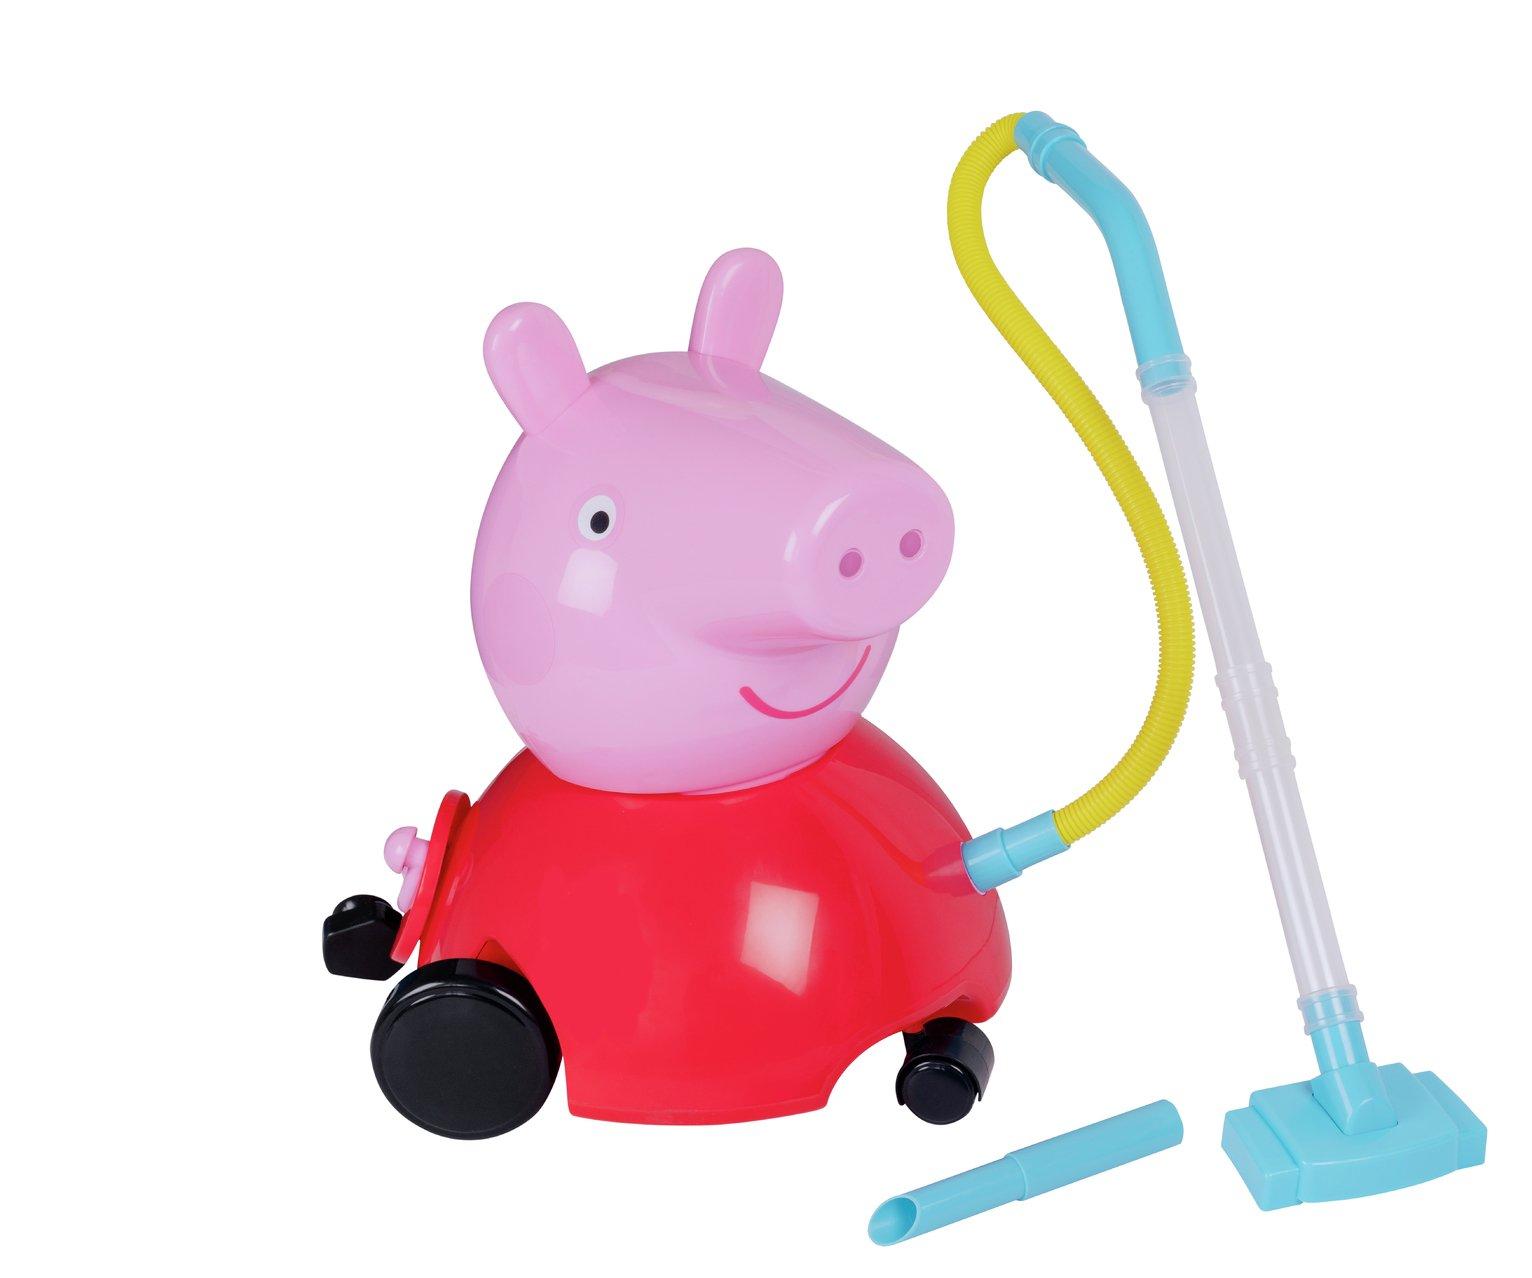 Peppa Pig Peppa's Vacuum Cleaner Activity Toy